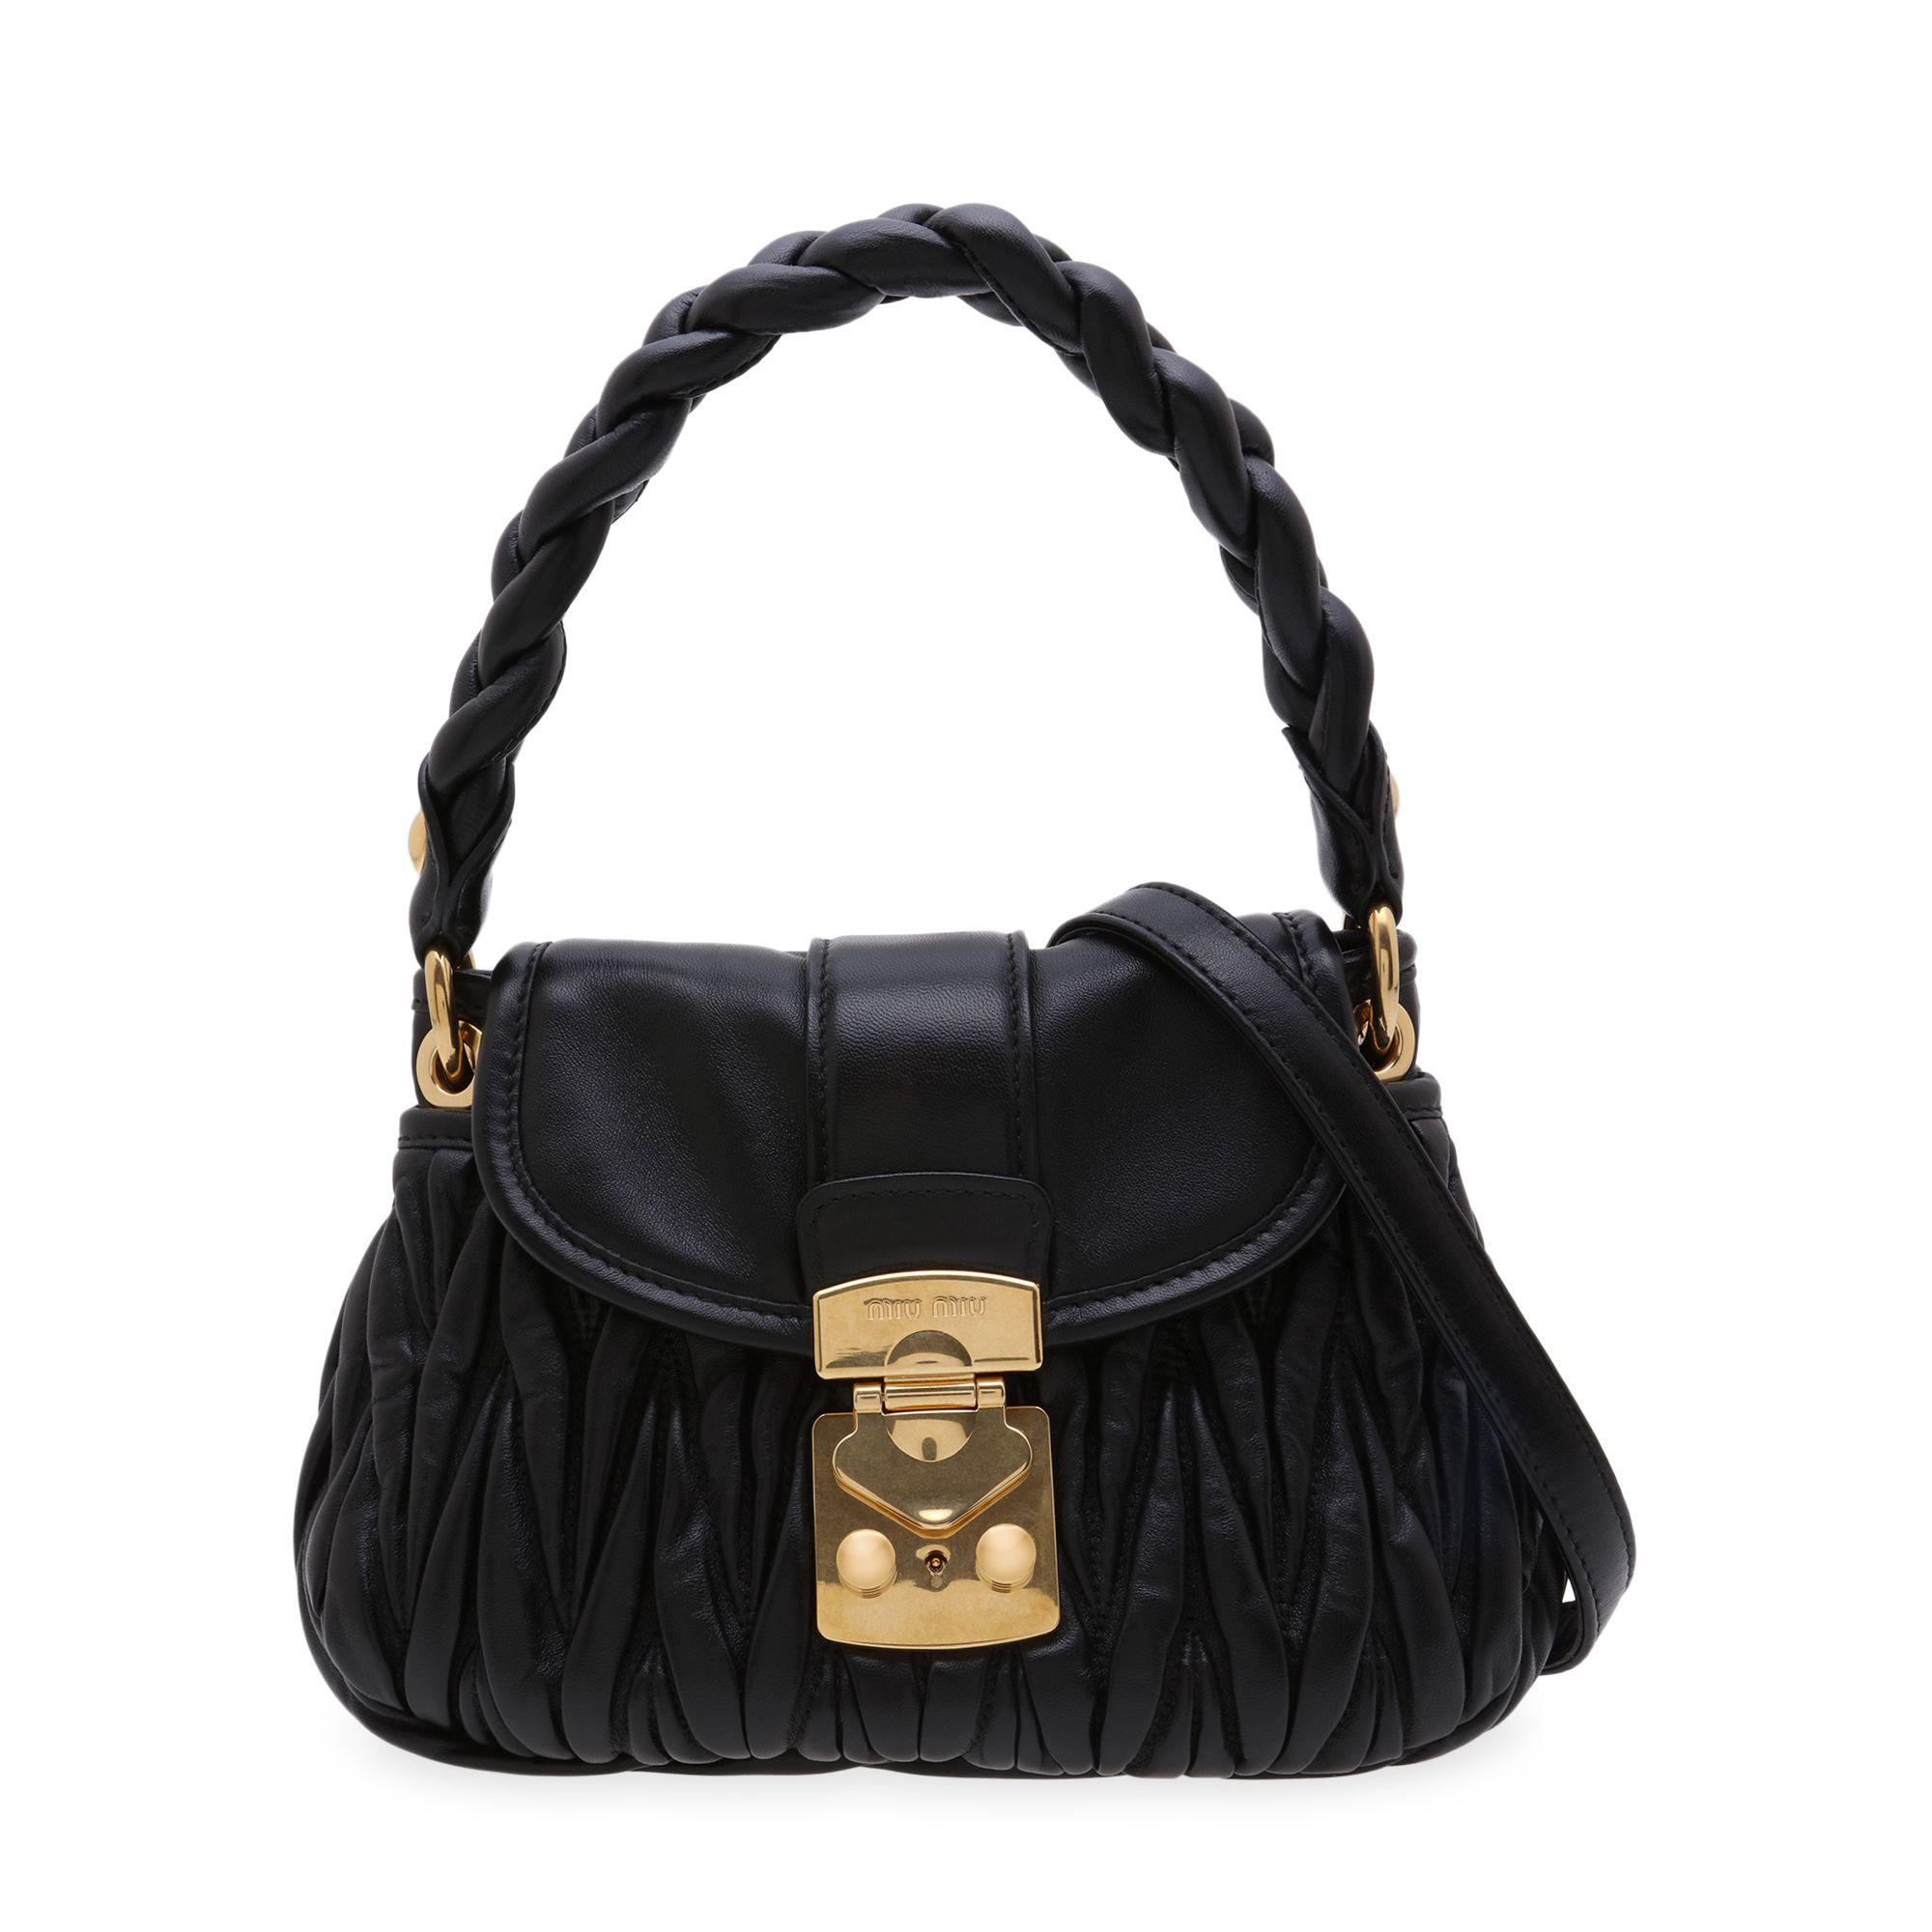 Matelassé leather handbag